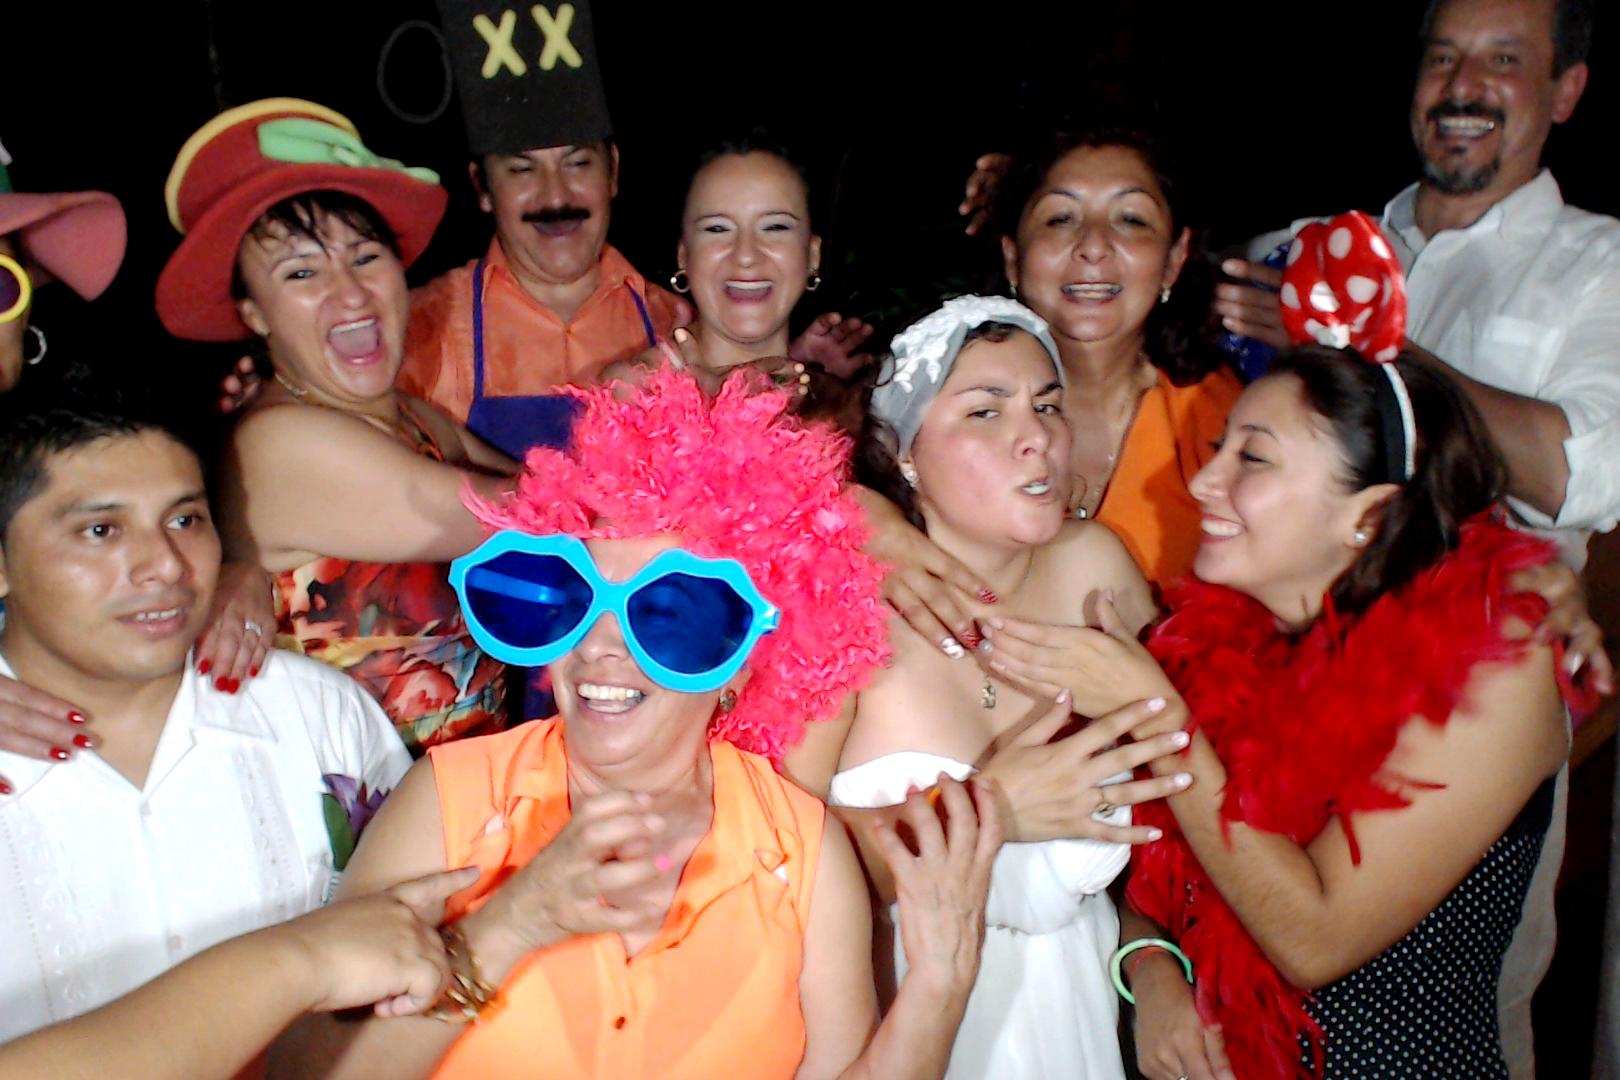 PlayadelCarmenPhotoBoothMexico00219.JPG